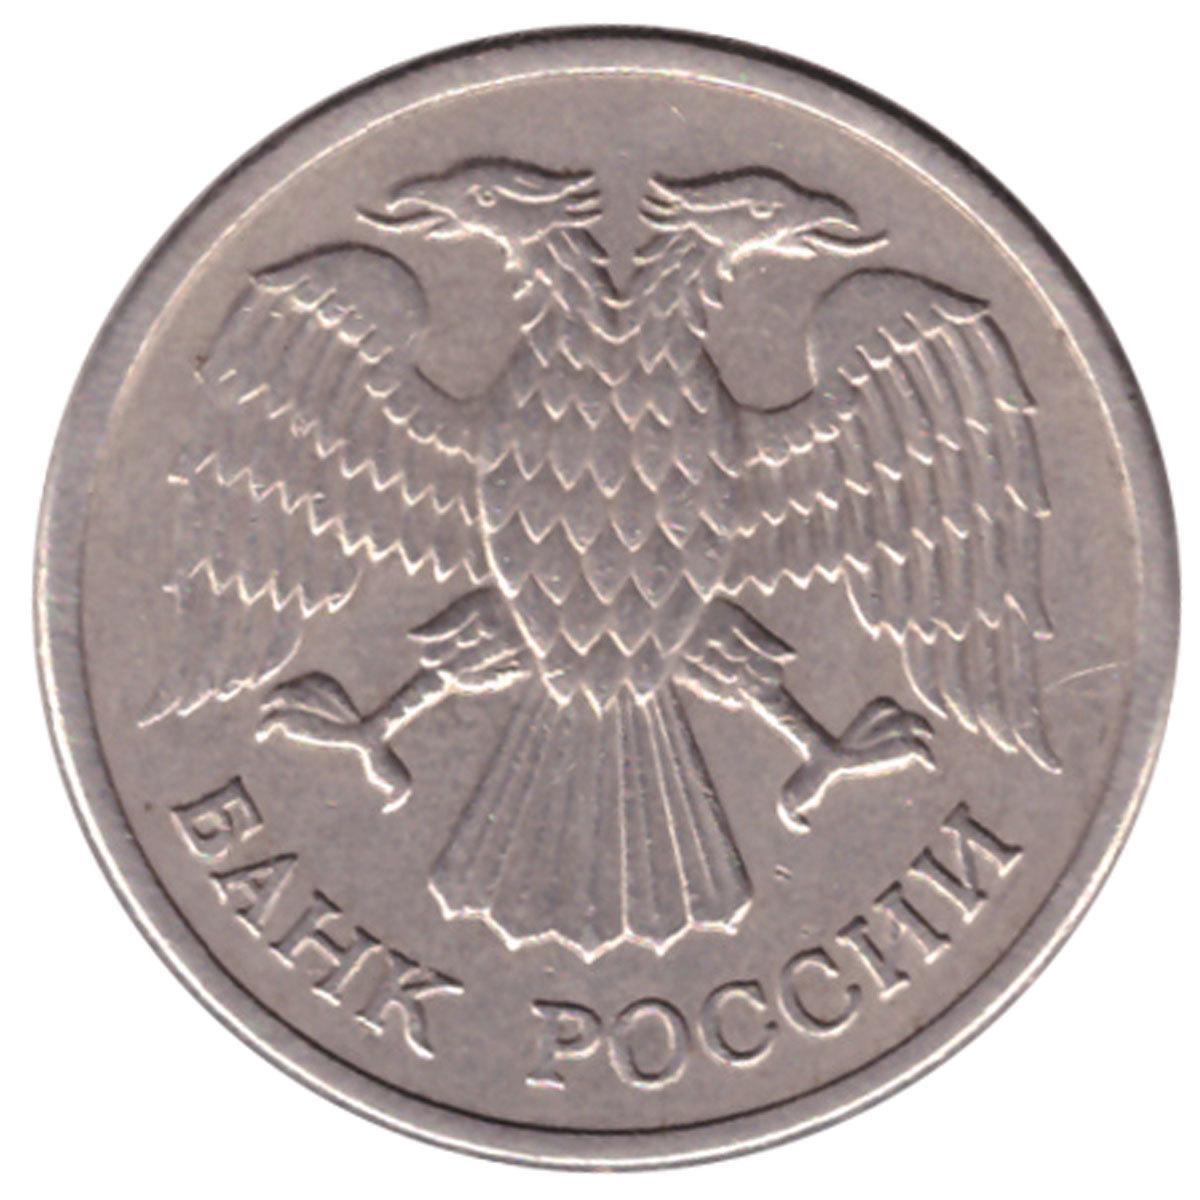 10 рублей ММД Магнитная 1992 год XF